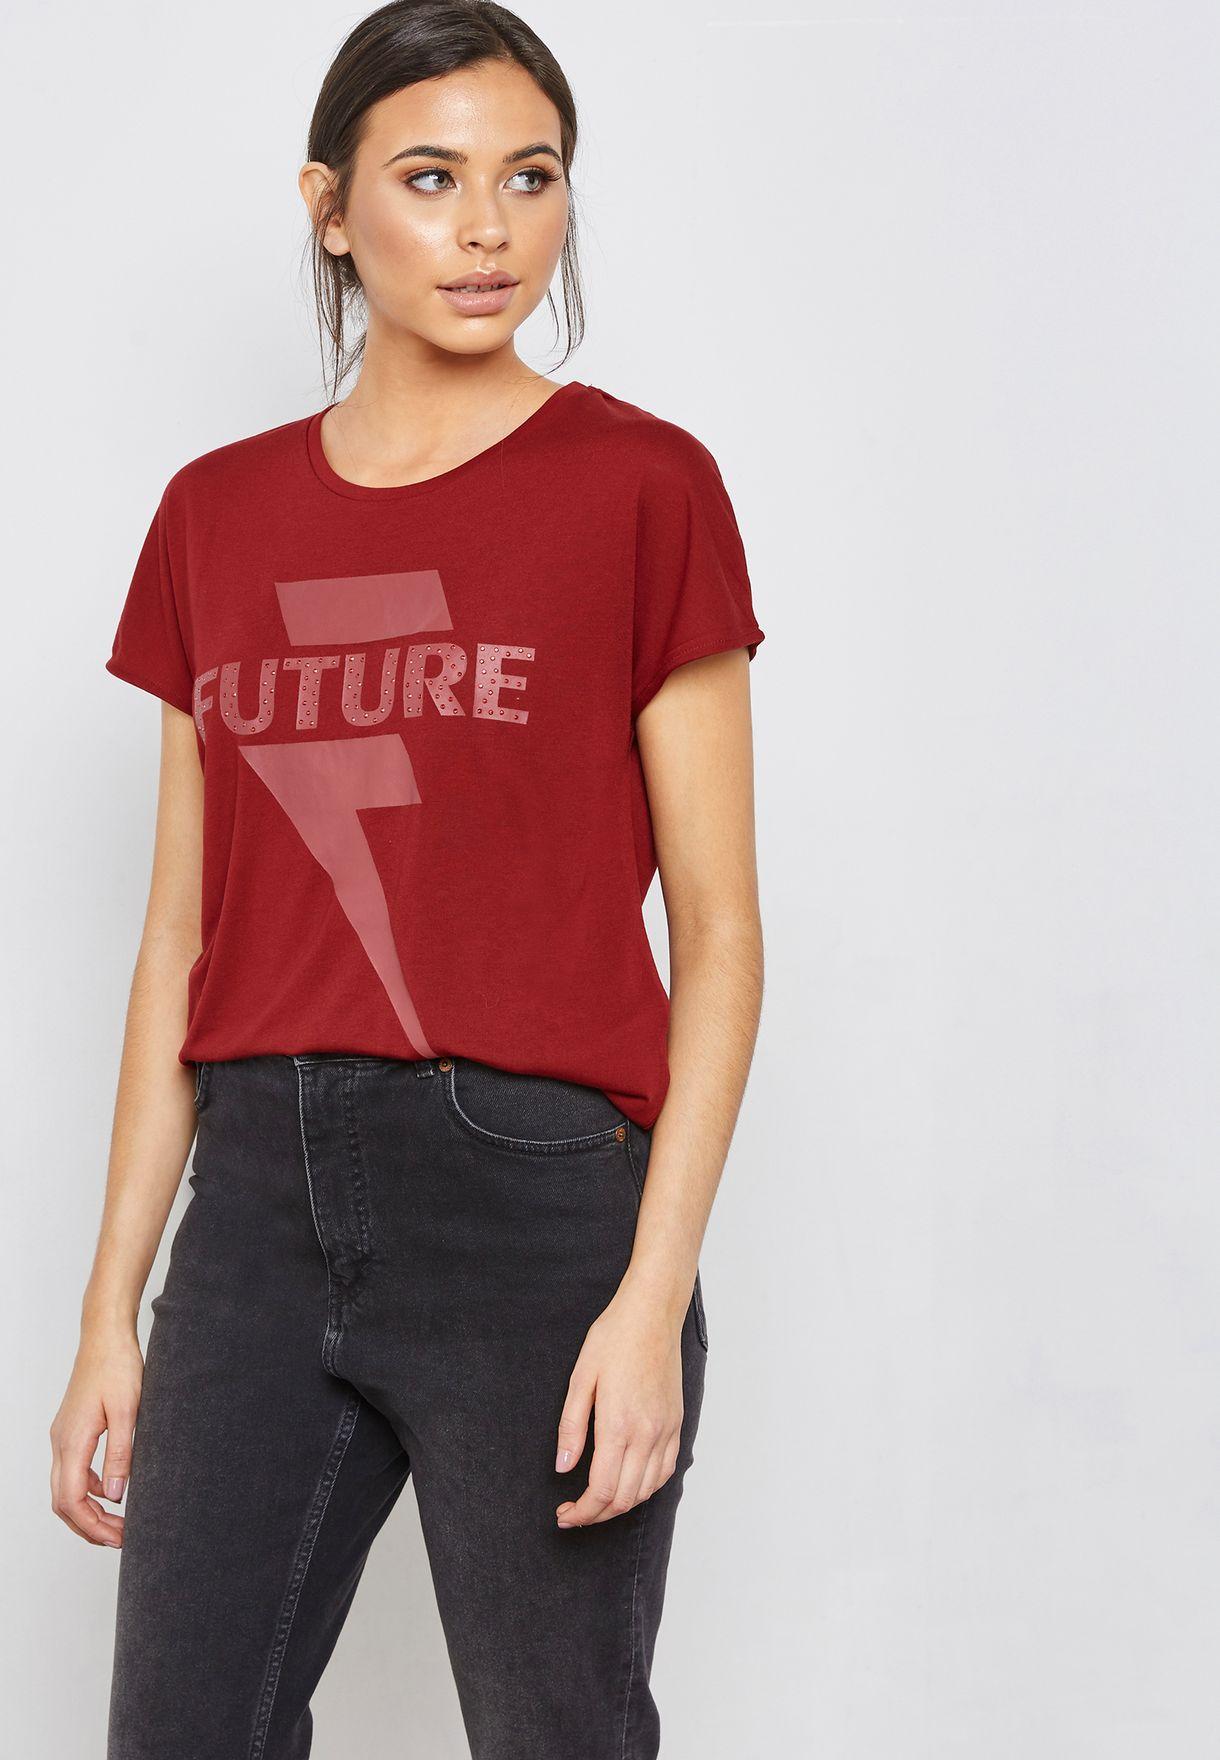 702e60ffdba Shop Jacqueline De Yong red Printed Short Sleeve T-Shirt 15161102 ...